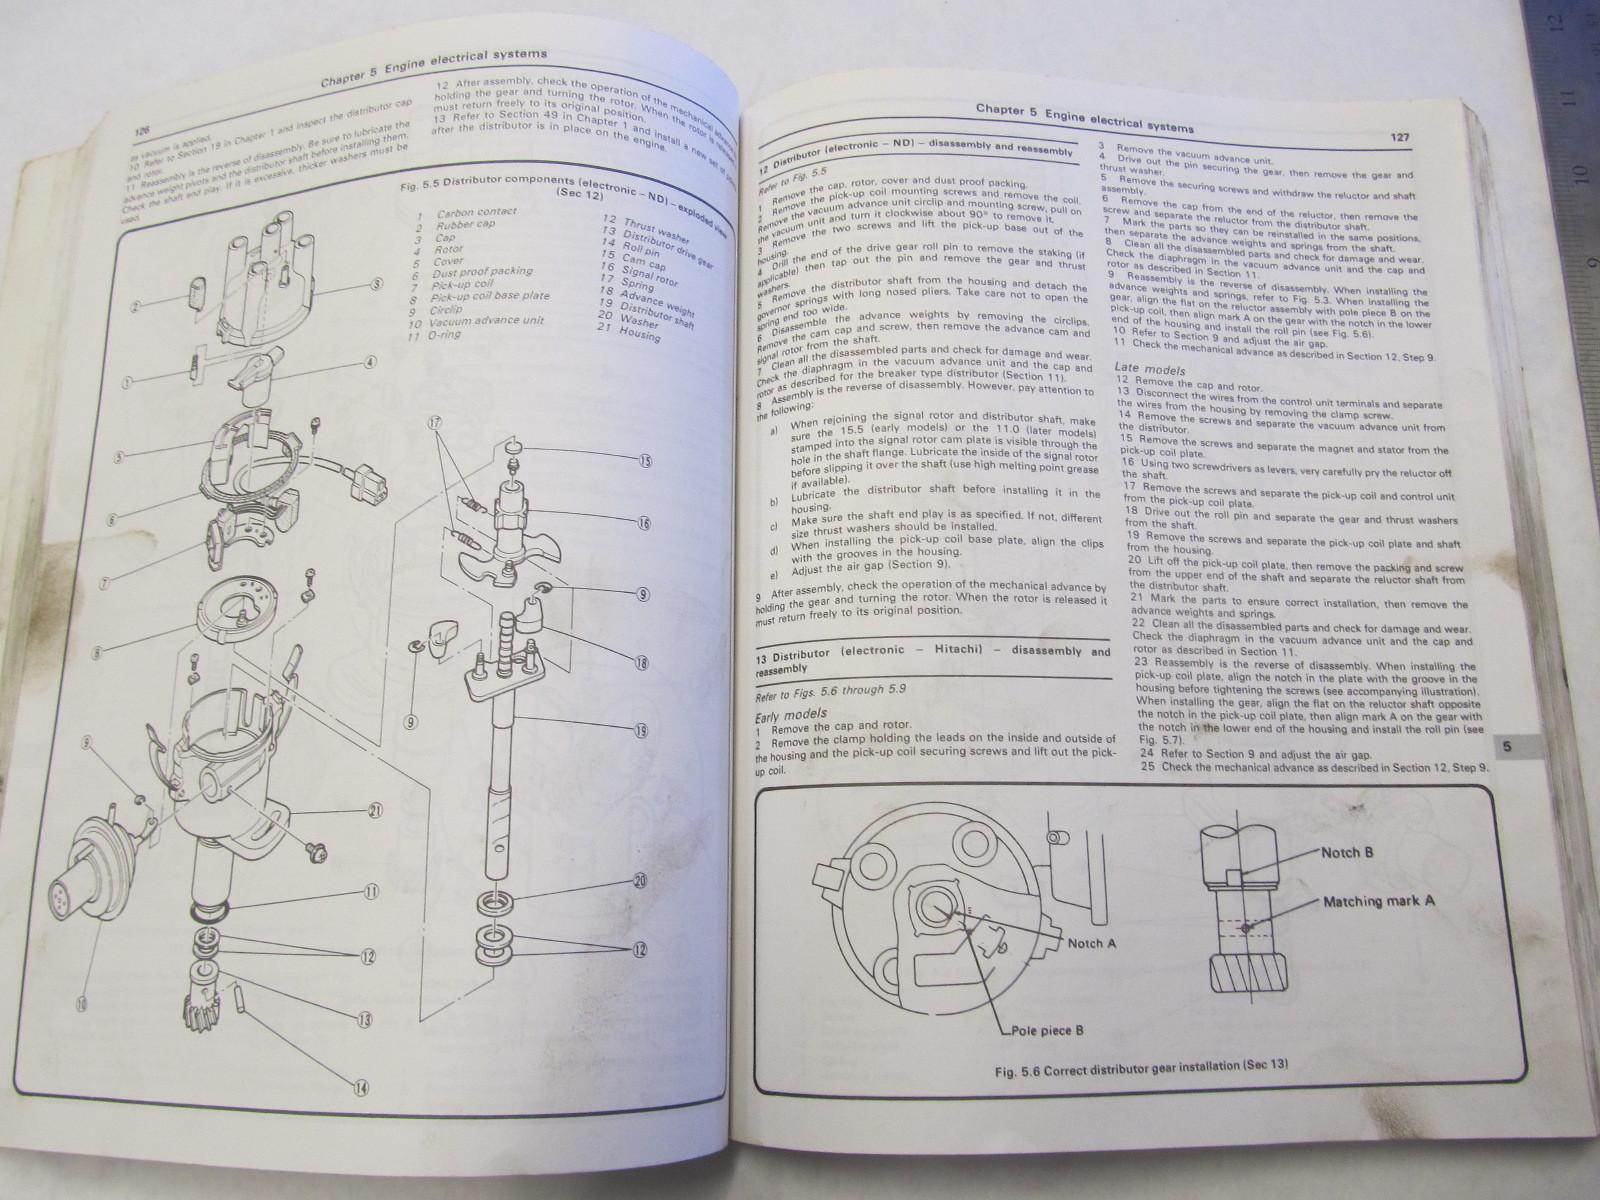 1980 1989 automotive repair manual subaru 1600 1800 green bay rh greenbayprop com 1989 Bayliner Capri 19 FT 1990 Bayliner Capri